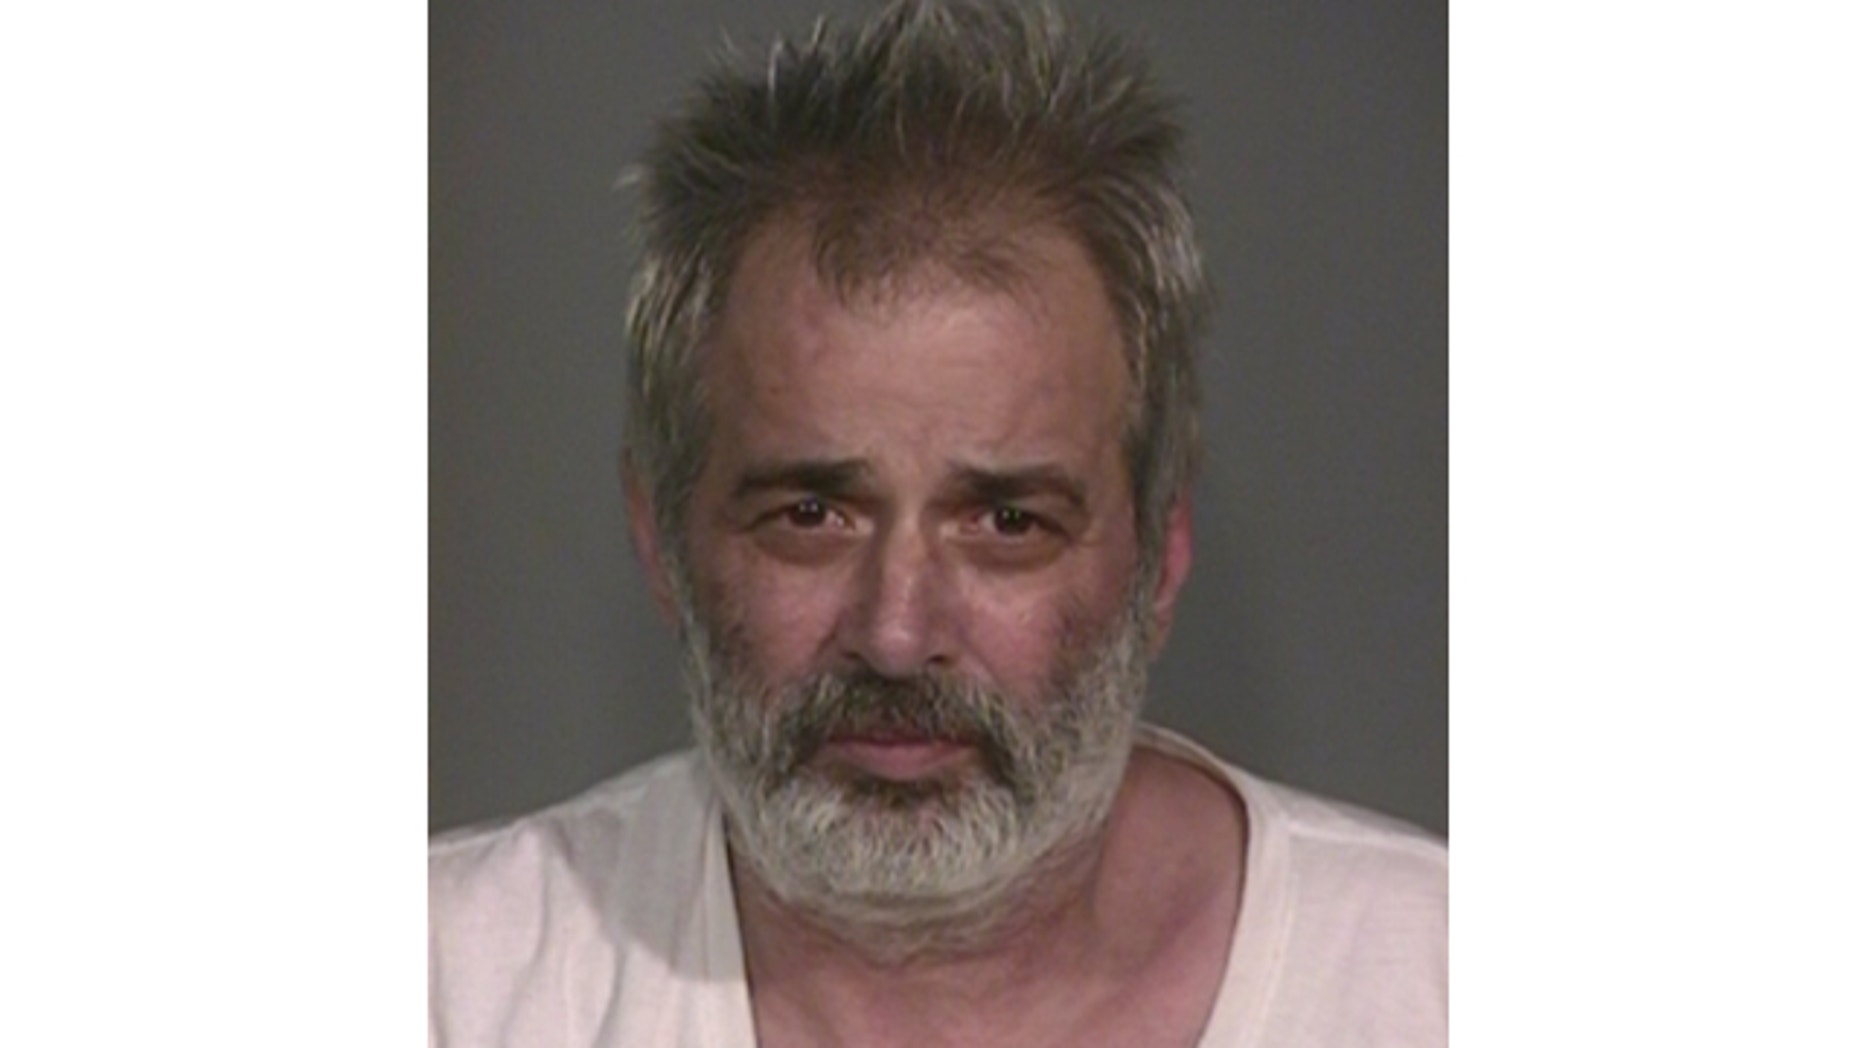 UNDATED: This Indianapolis Metropolitan Police Department booking photo shows Michael Ackerman.